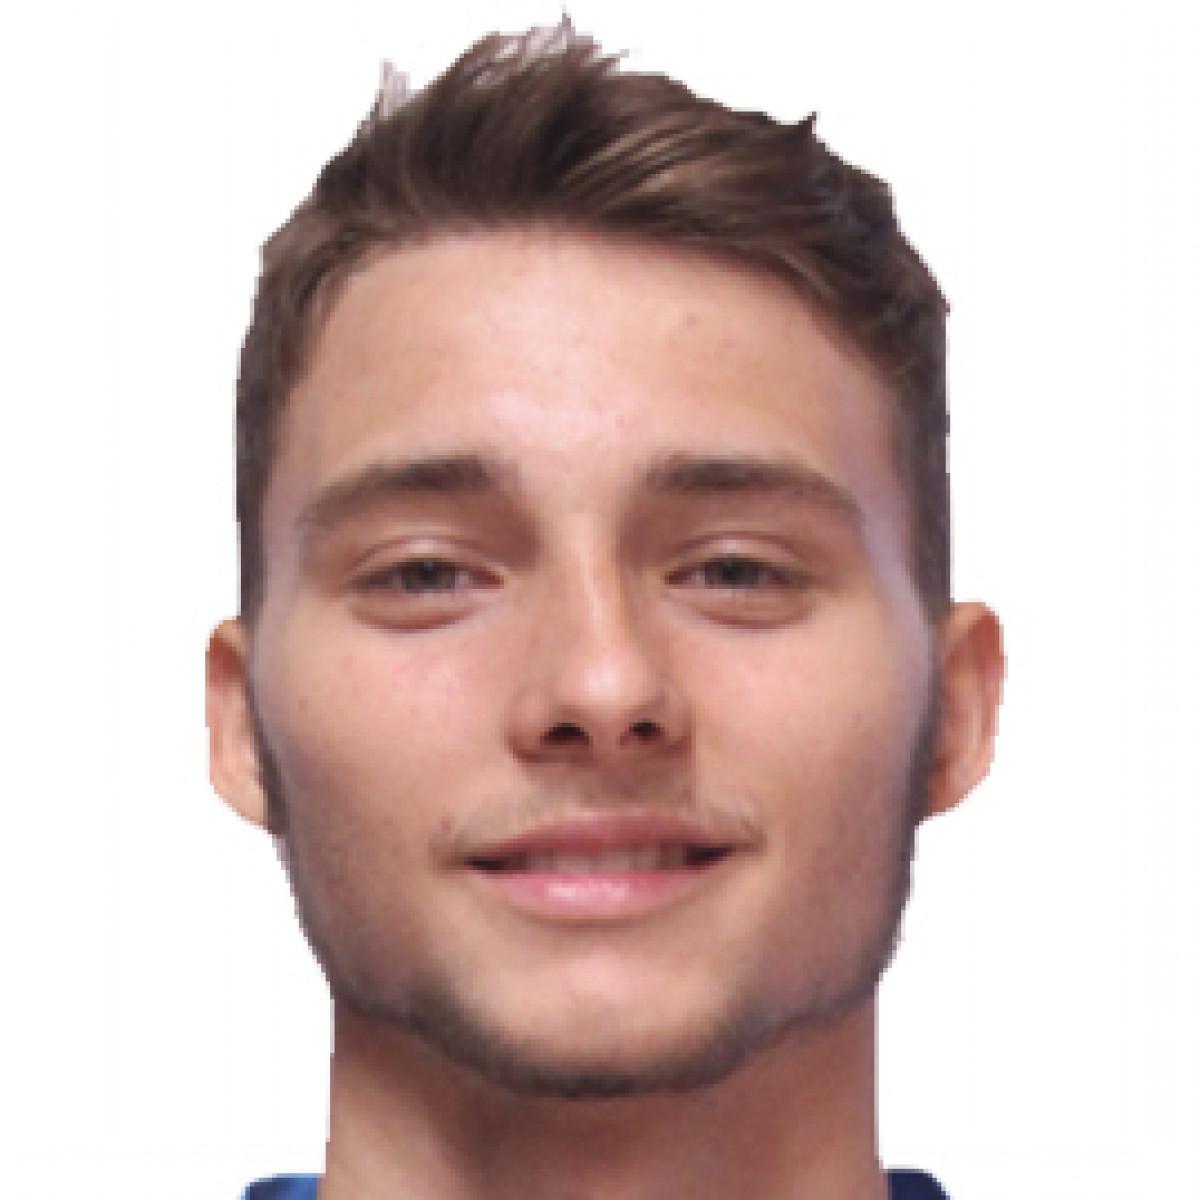 Erik Klepac